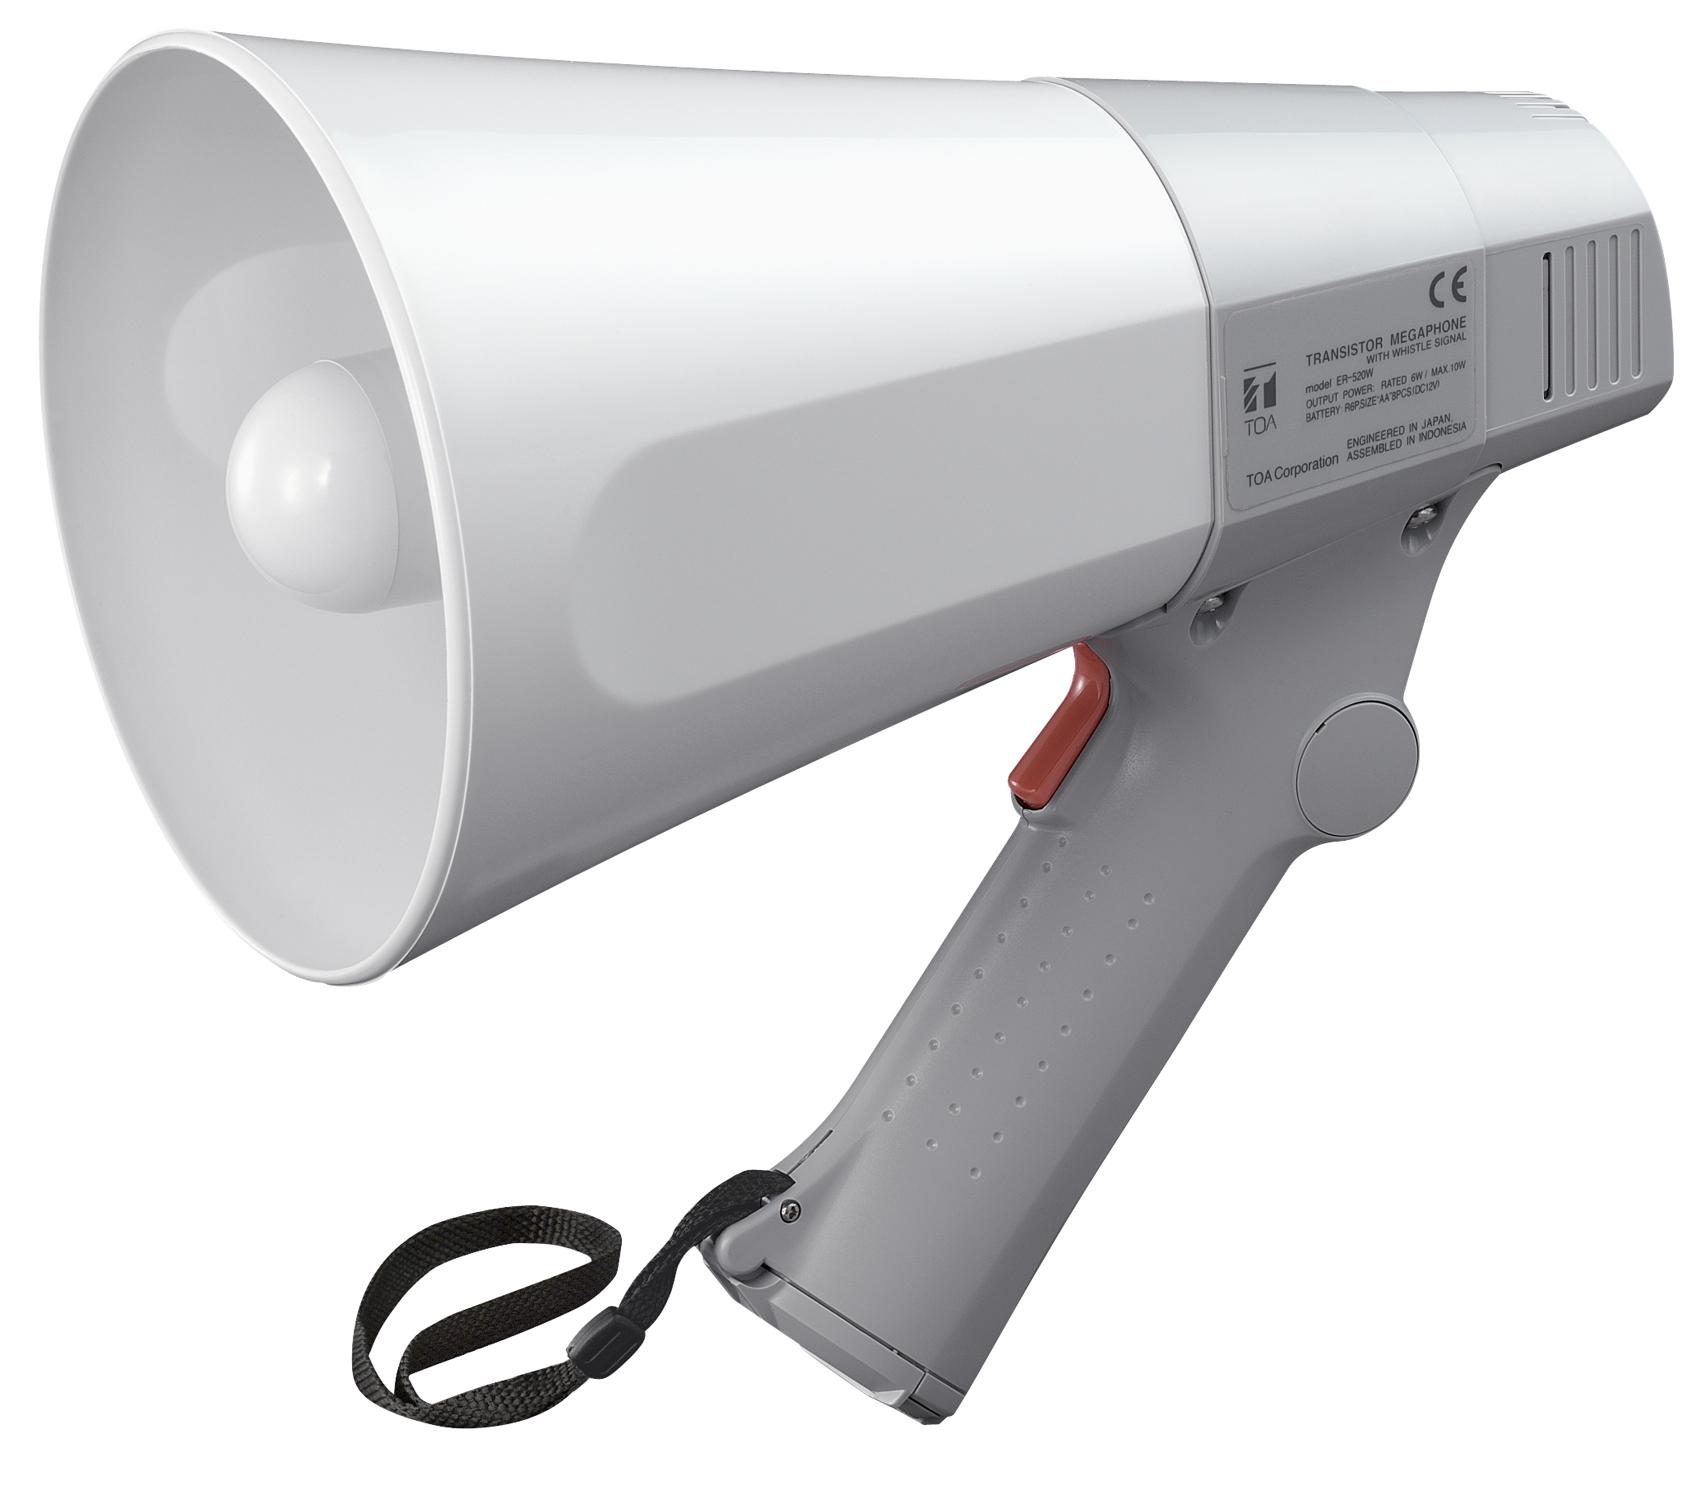 TOA ER-520W 6W Compact Handheld Megaphone w/ Whistle